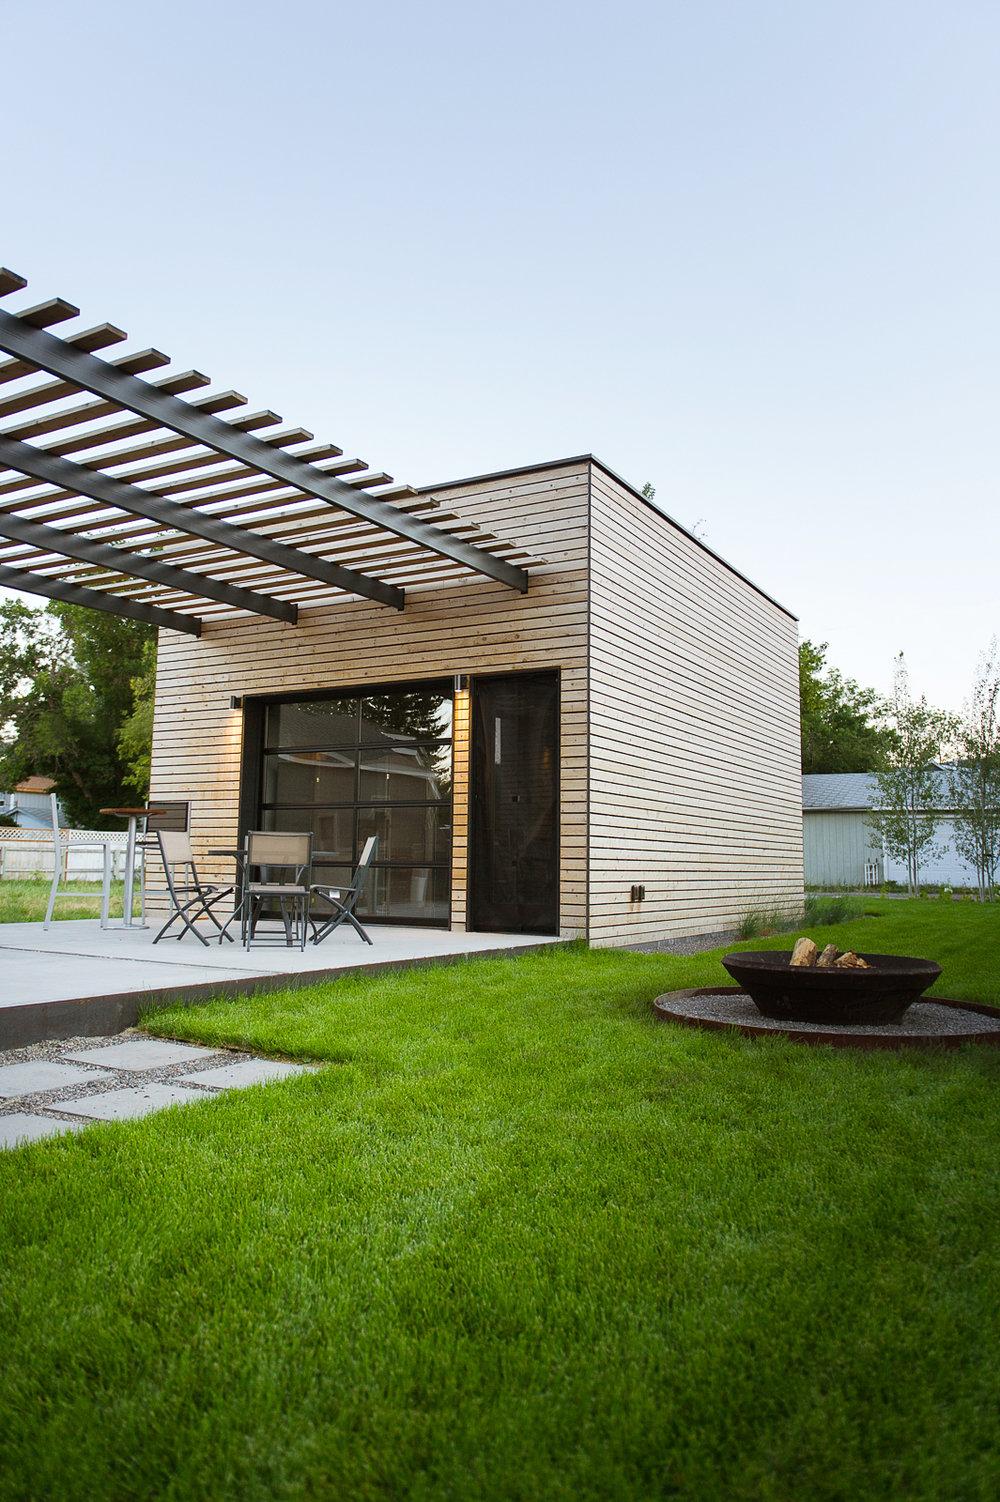 Woodworks-West-Bozeman-Montana-Builder-Cabinetry-Remodel-New-Construction-2800.jpg